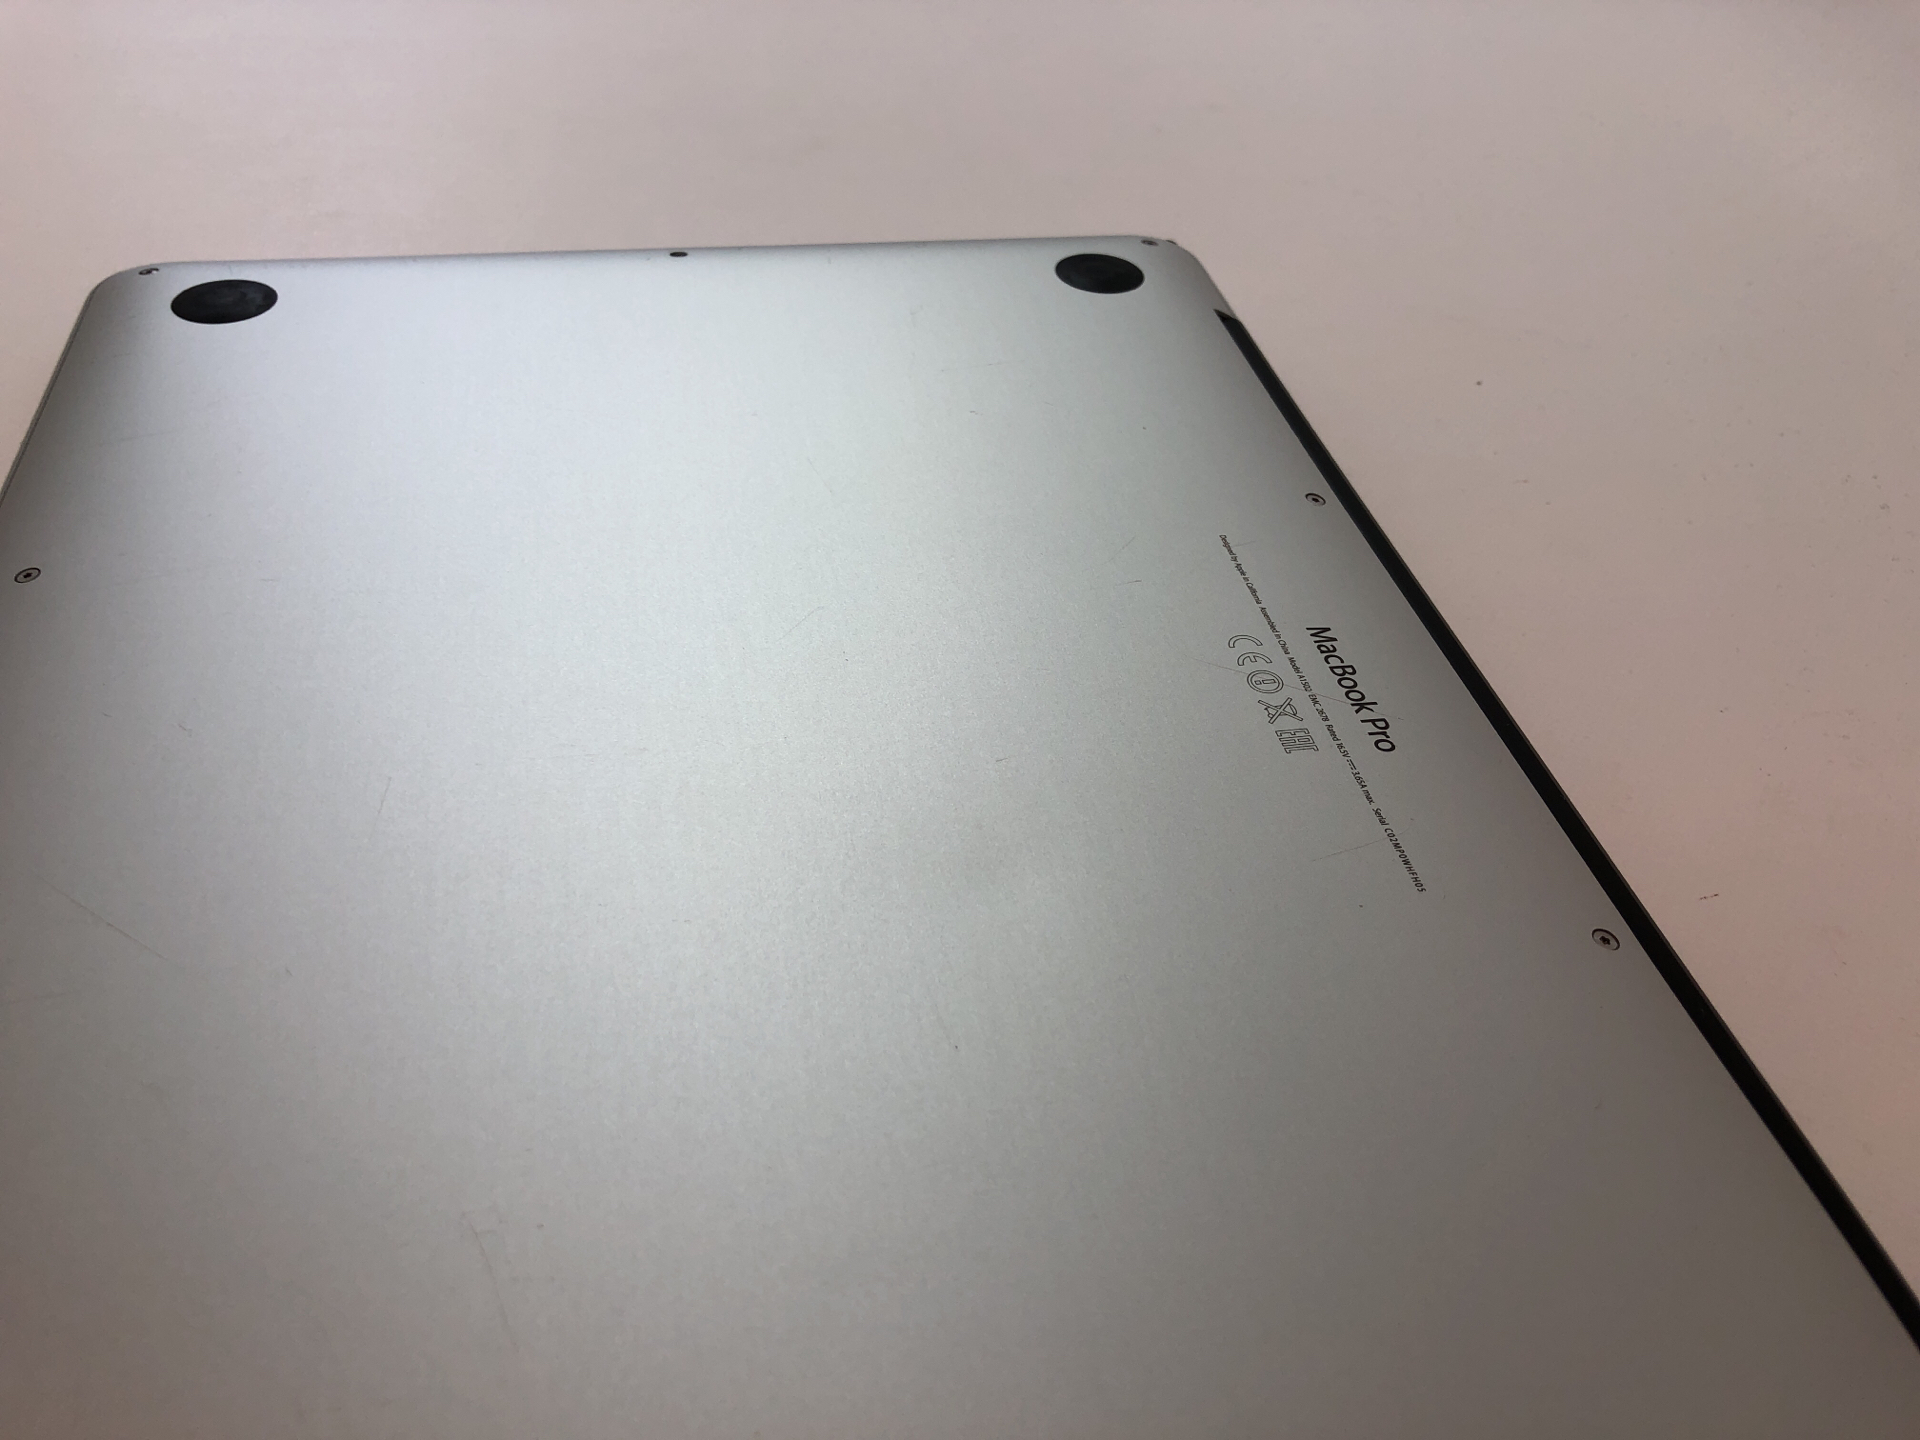 "MacBook Pro Retina 13"" Late 2013 (Intel Core i7 2.8 GHz 16 GB RAM 512 GB SSD), Intel Core i7 2.8 GHz, 16 GB RAM, 512 GB SSD, bild 4"